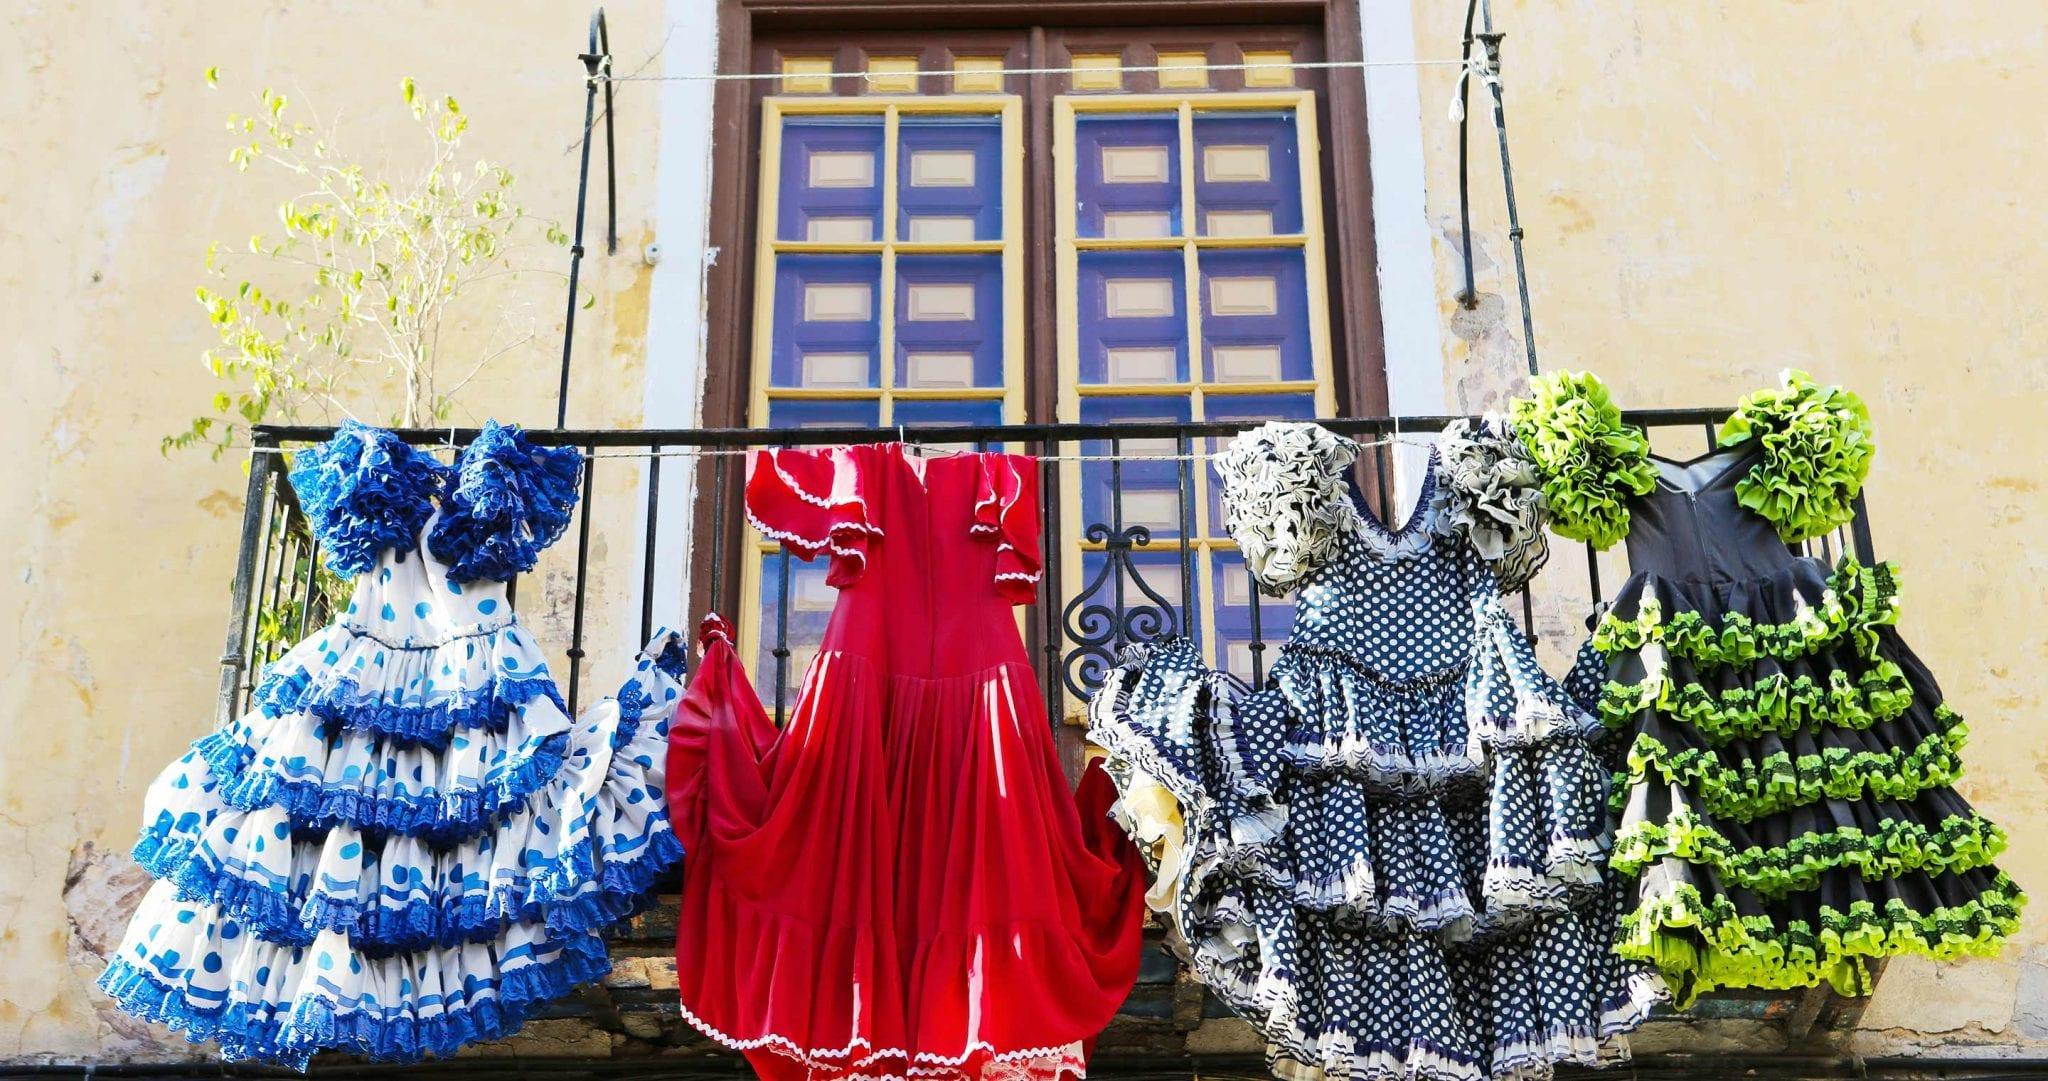 Rundreise Andalusien - Maurisches Erbe trifft Flamenco